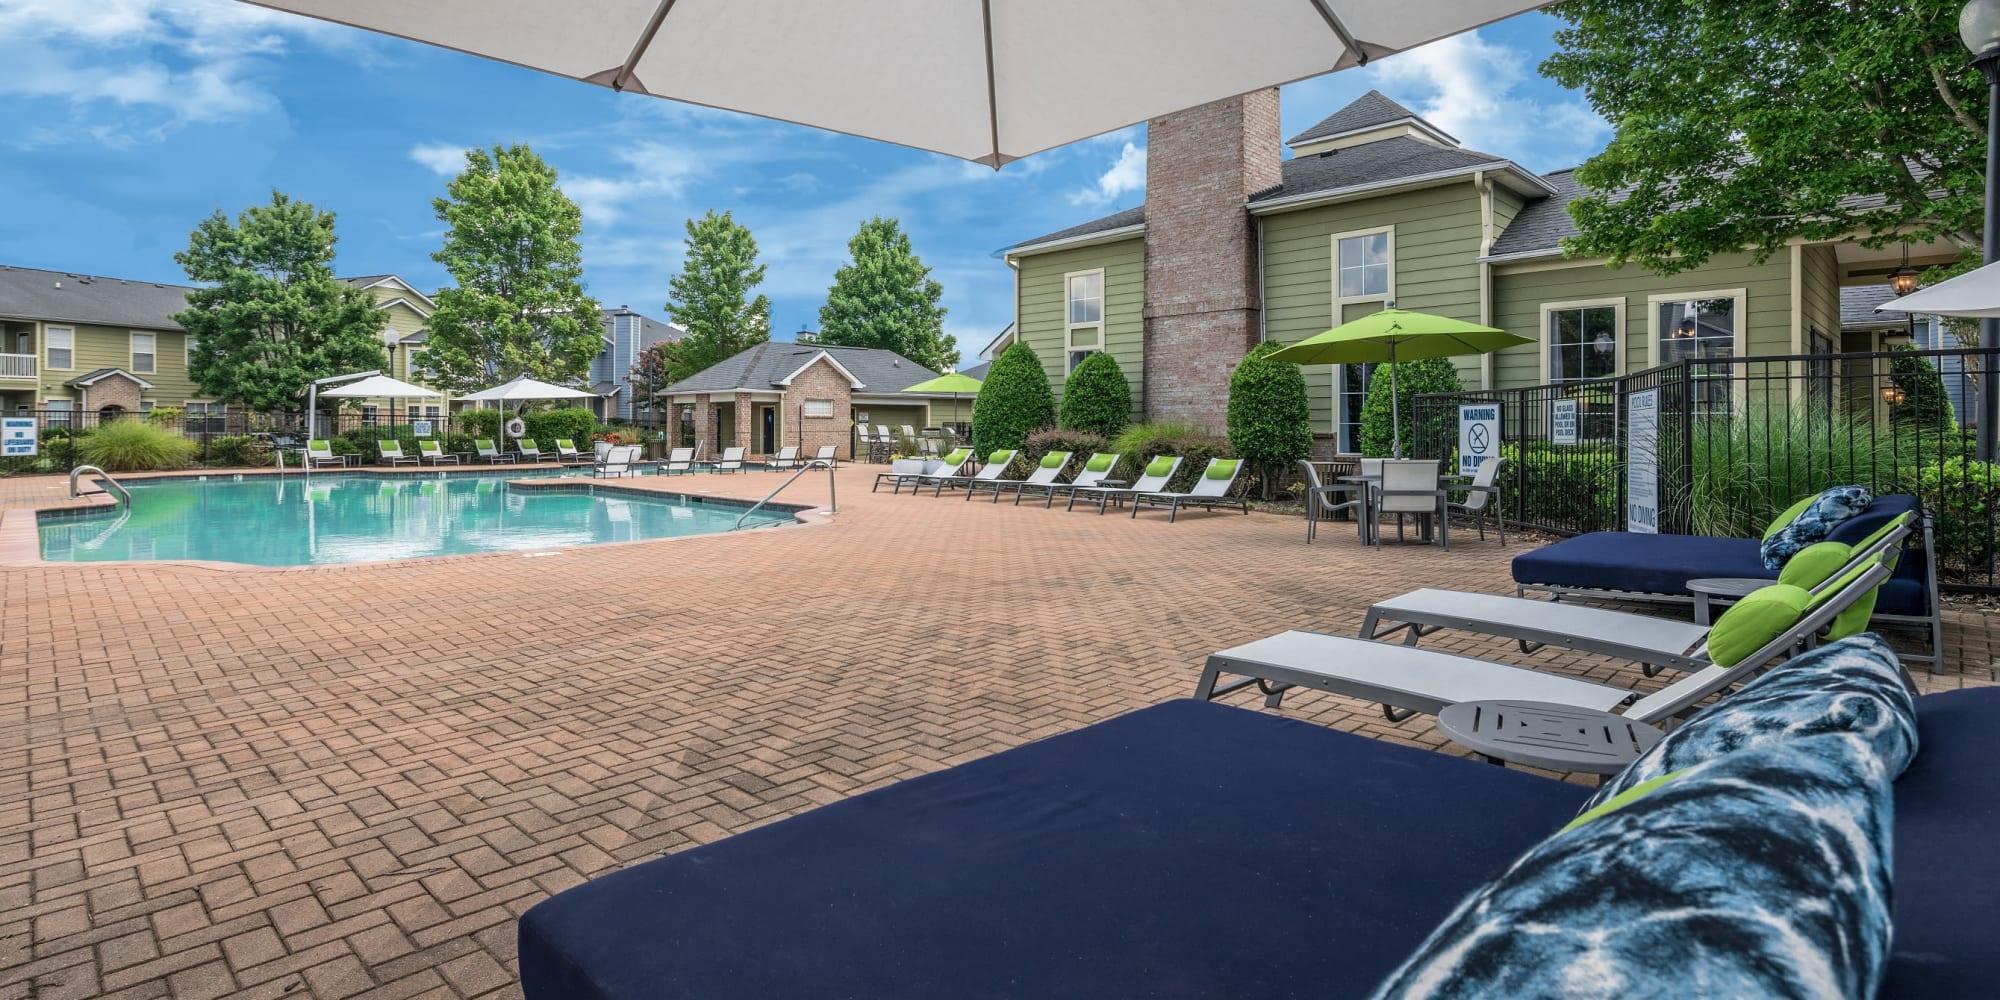 Apartments at Highlands at Alexander Pointe in Charlotte, North Carolina